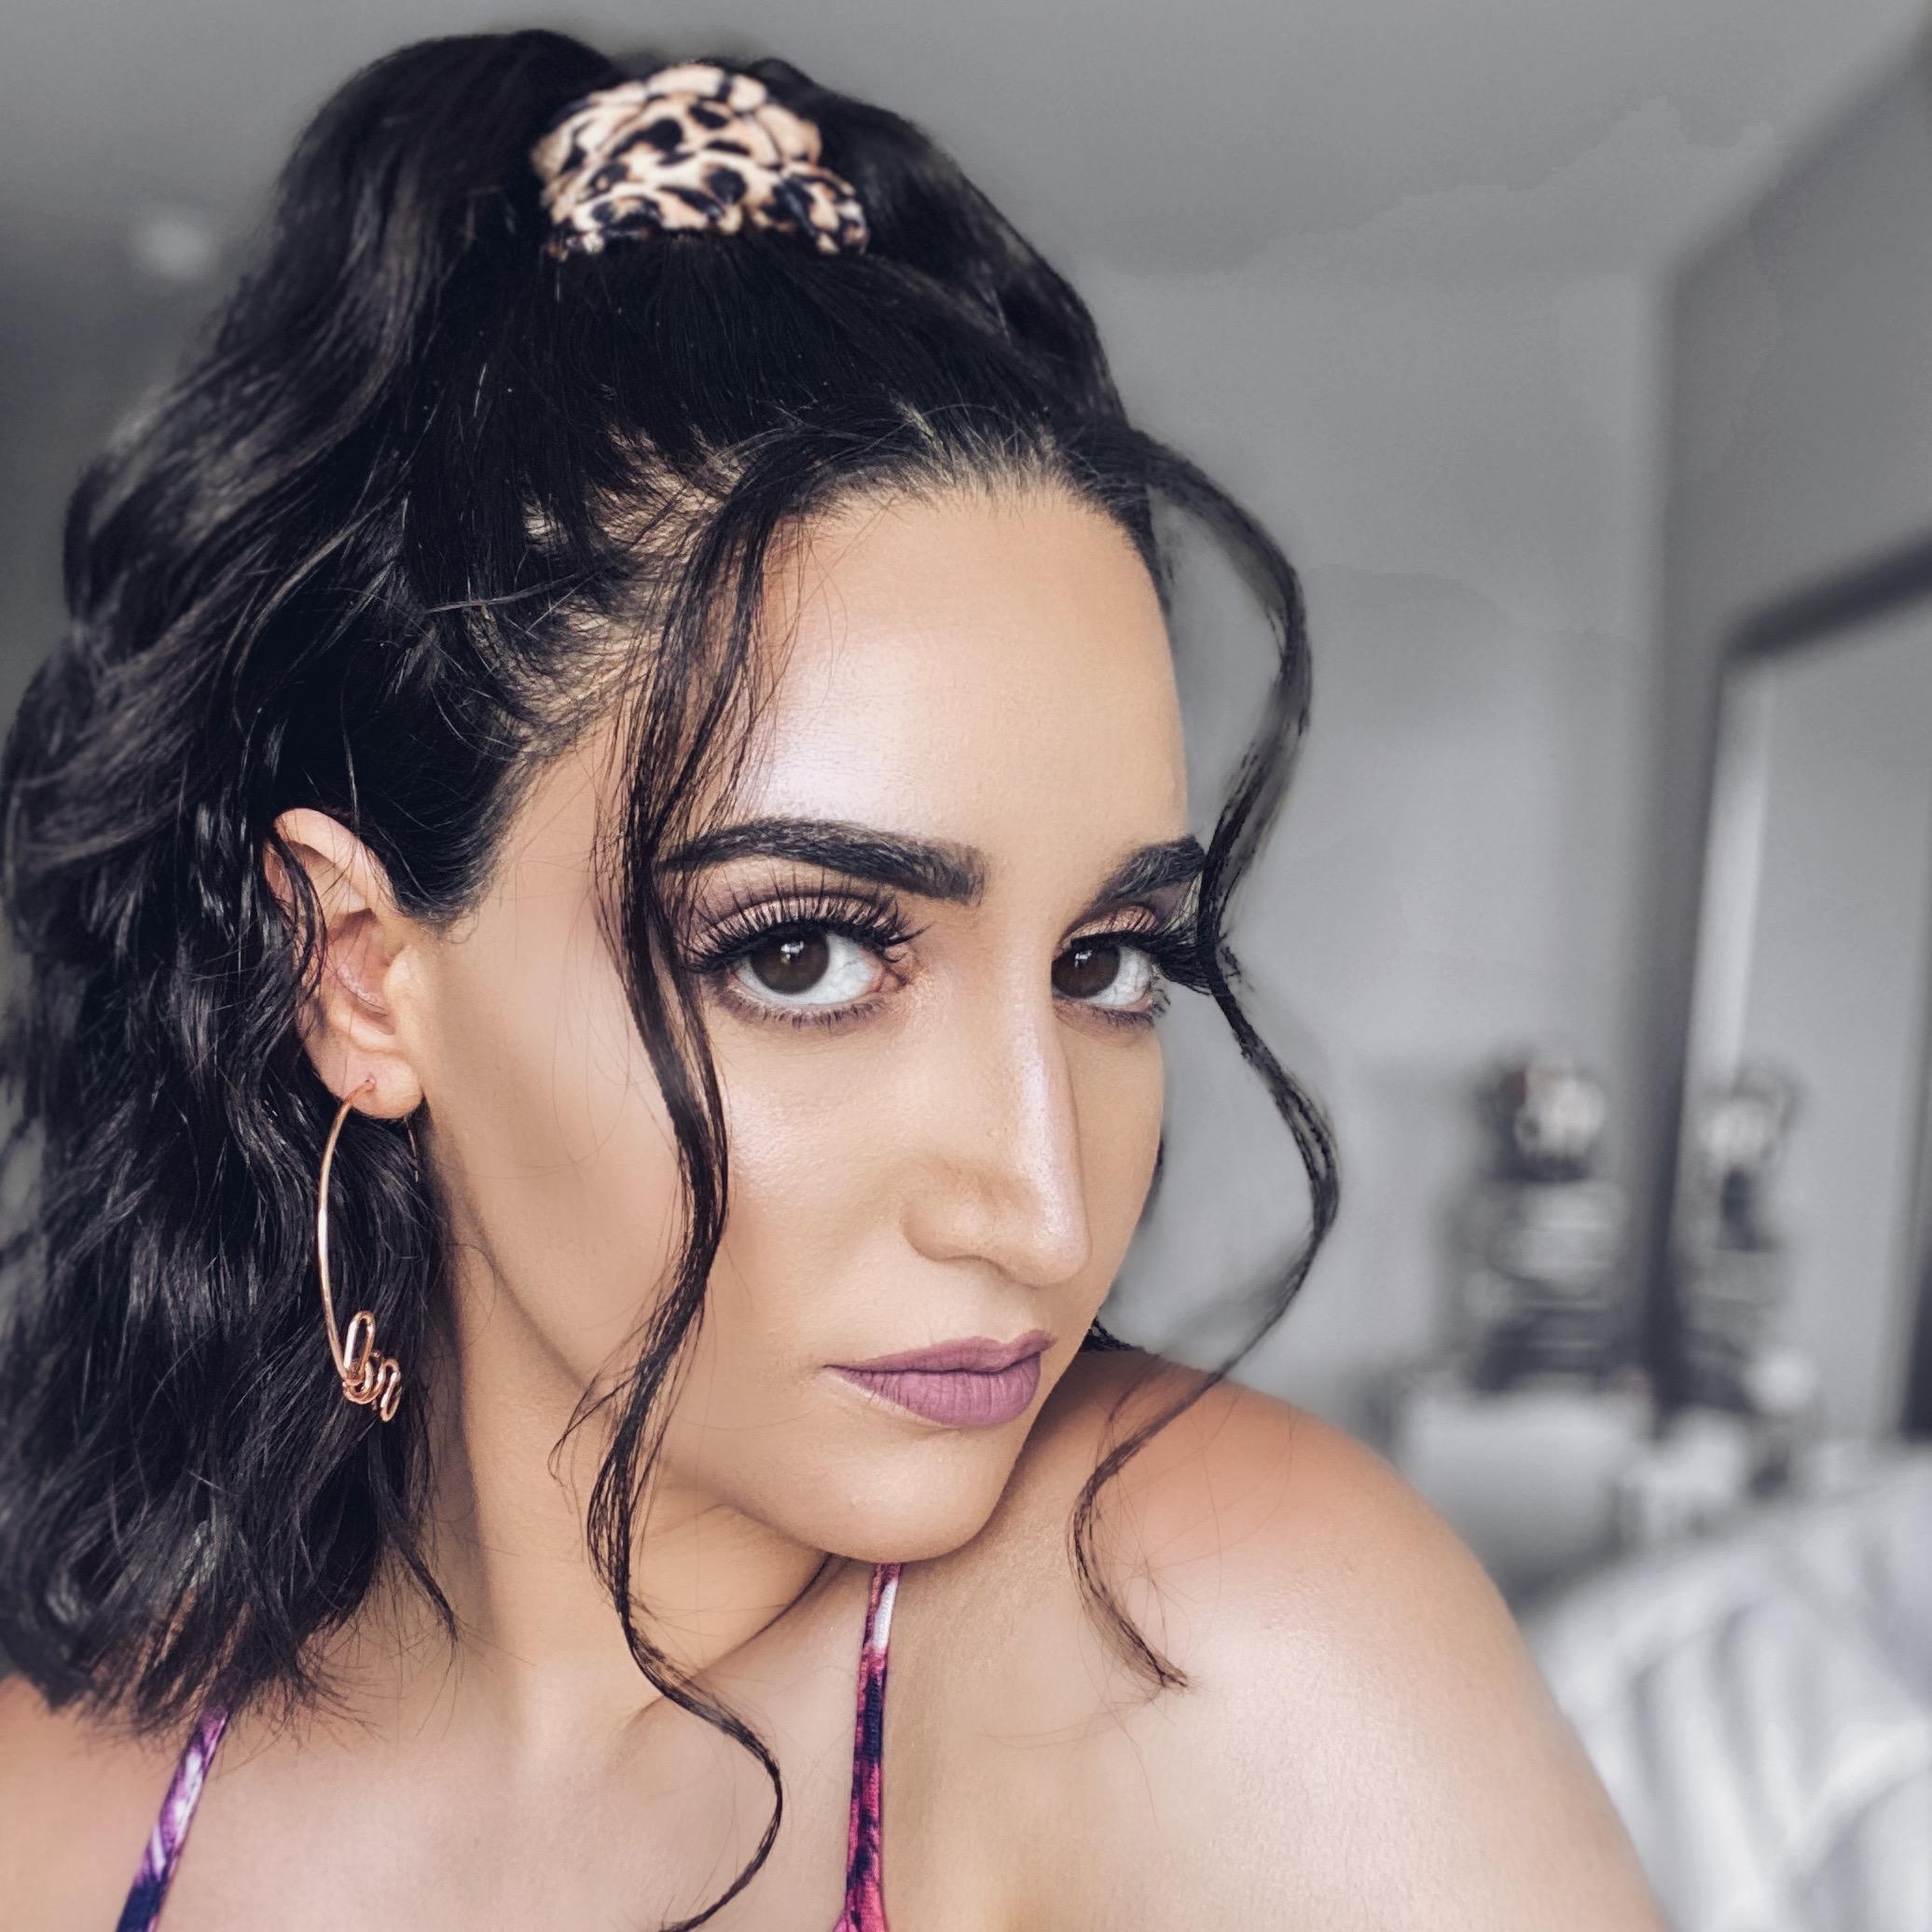 @janeenhamad profile image